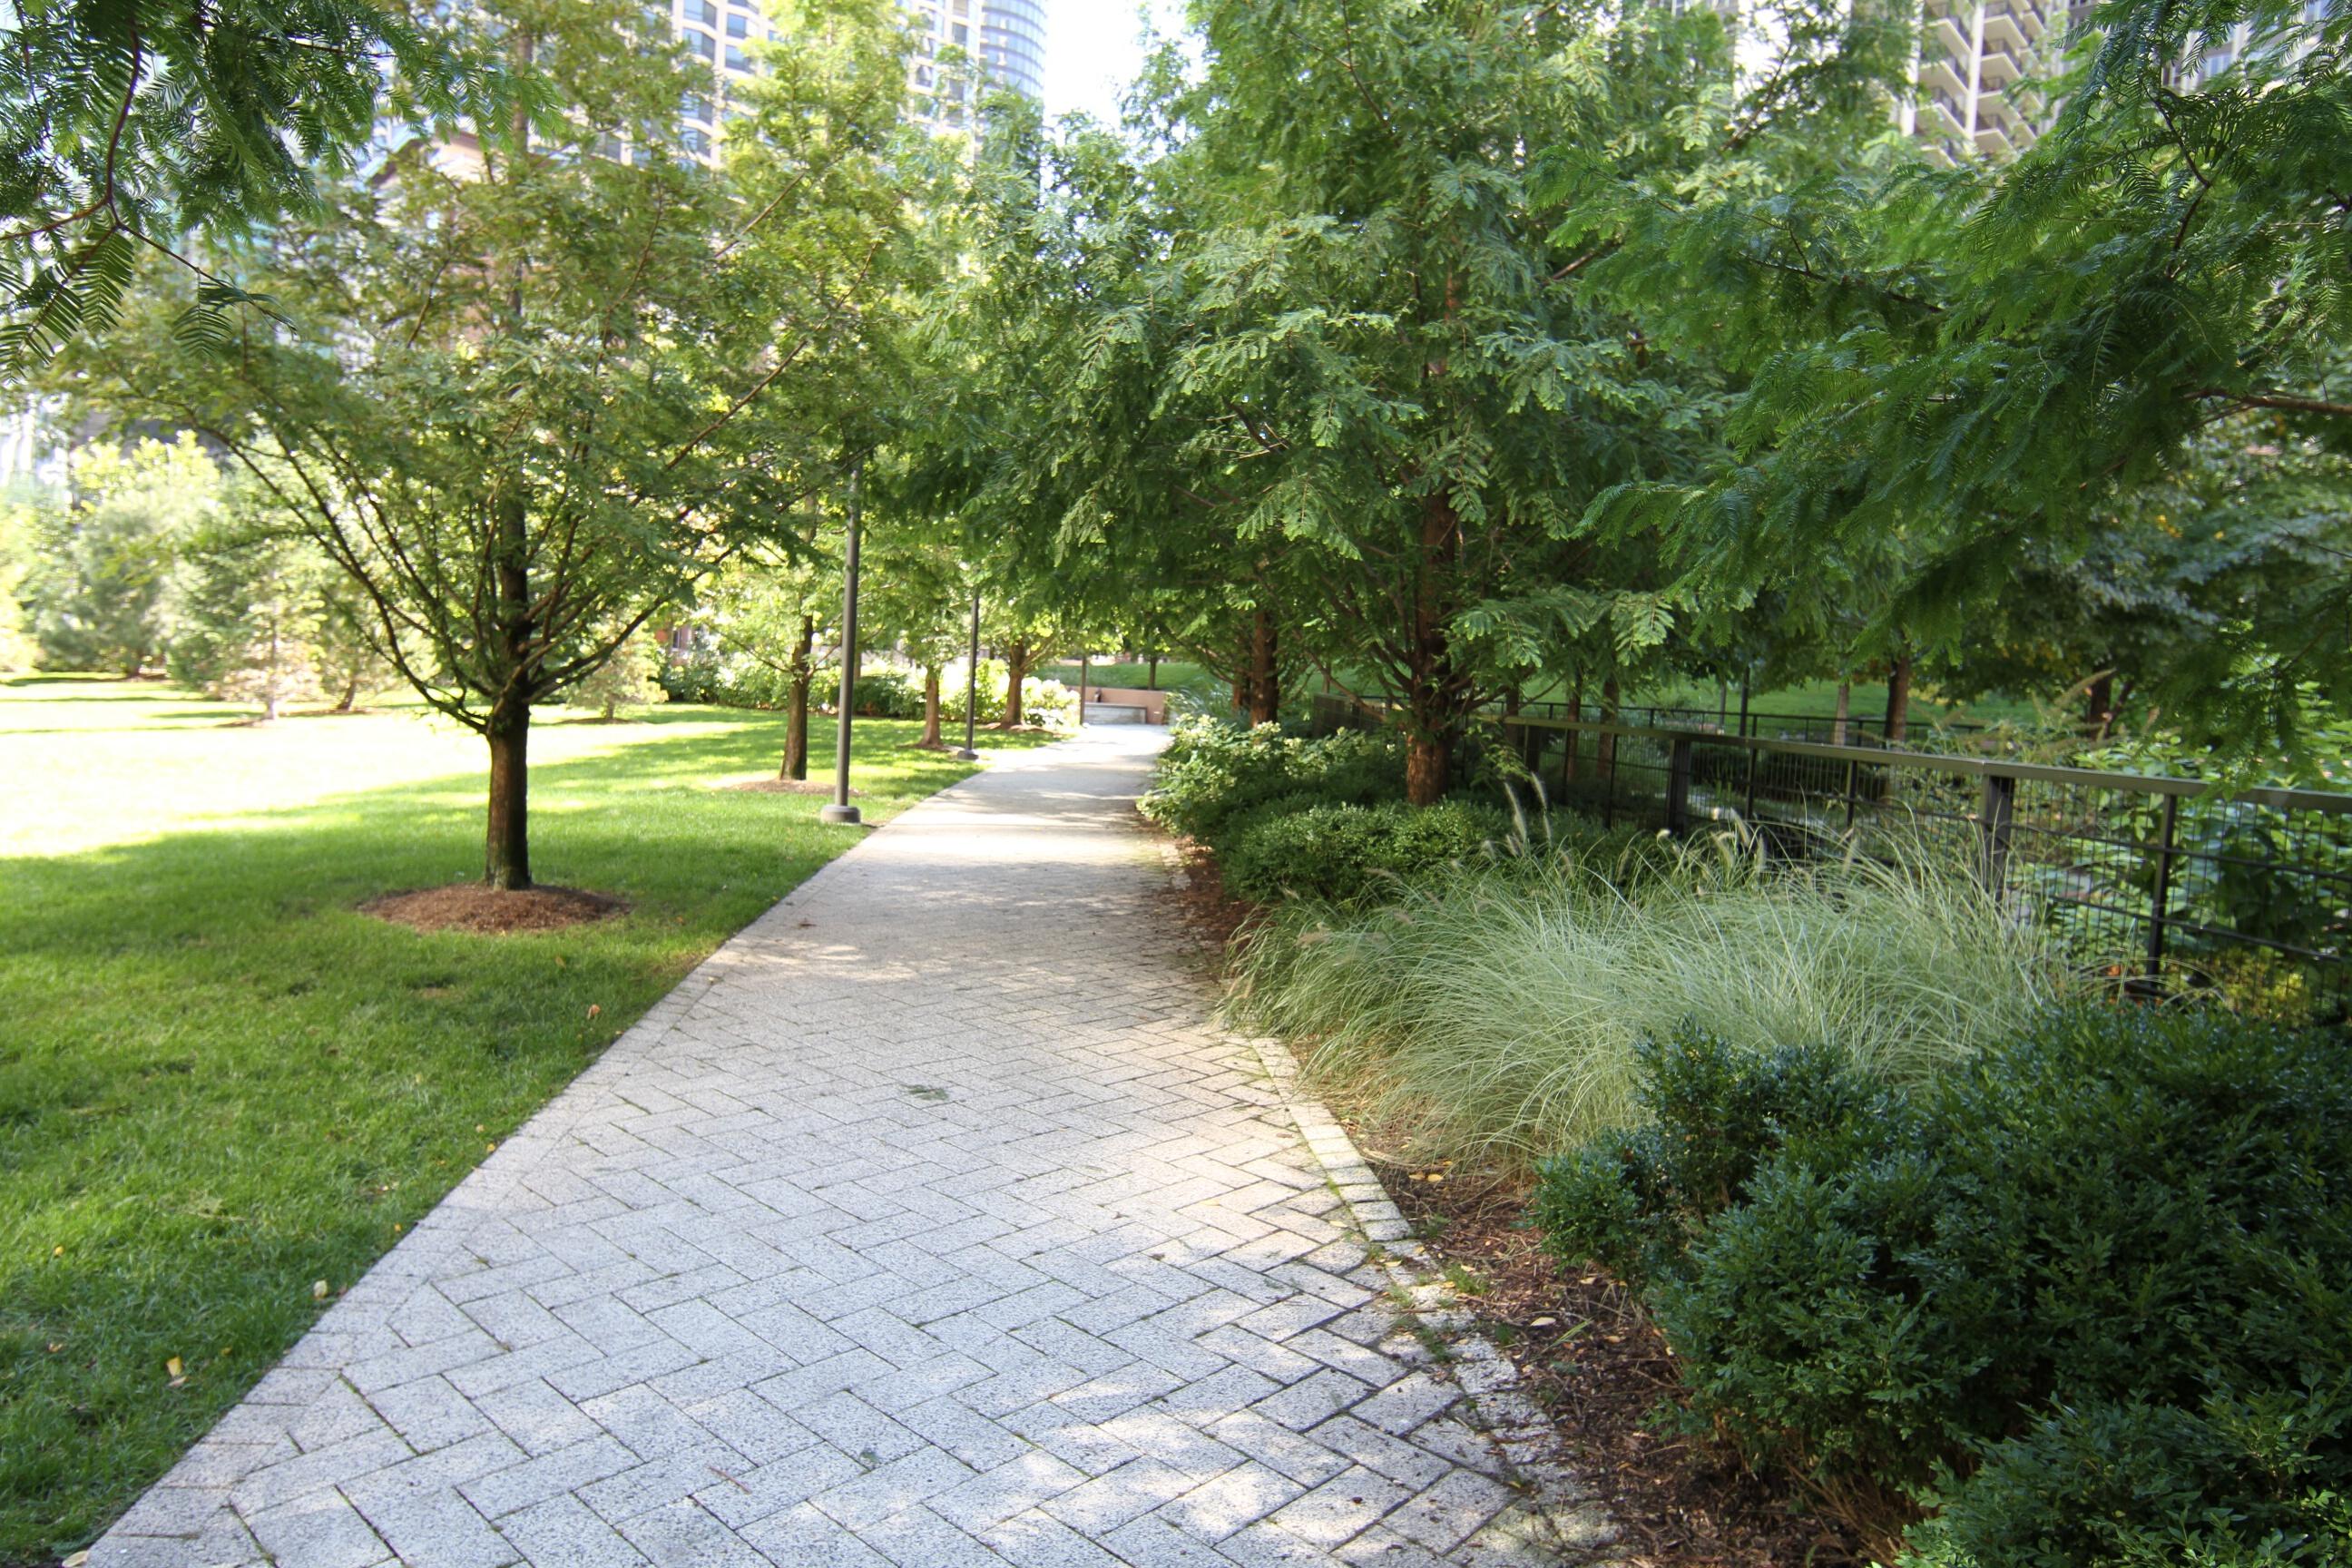 Pathway of serenity